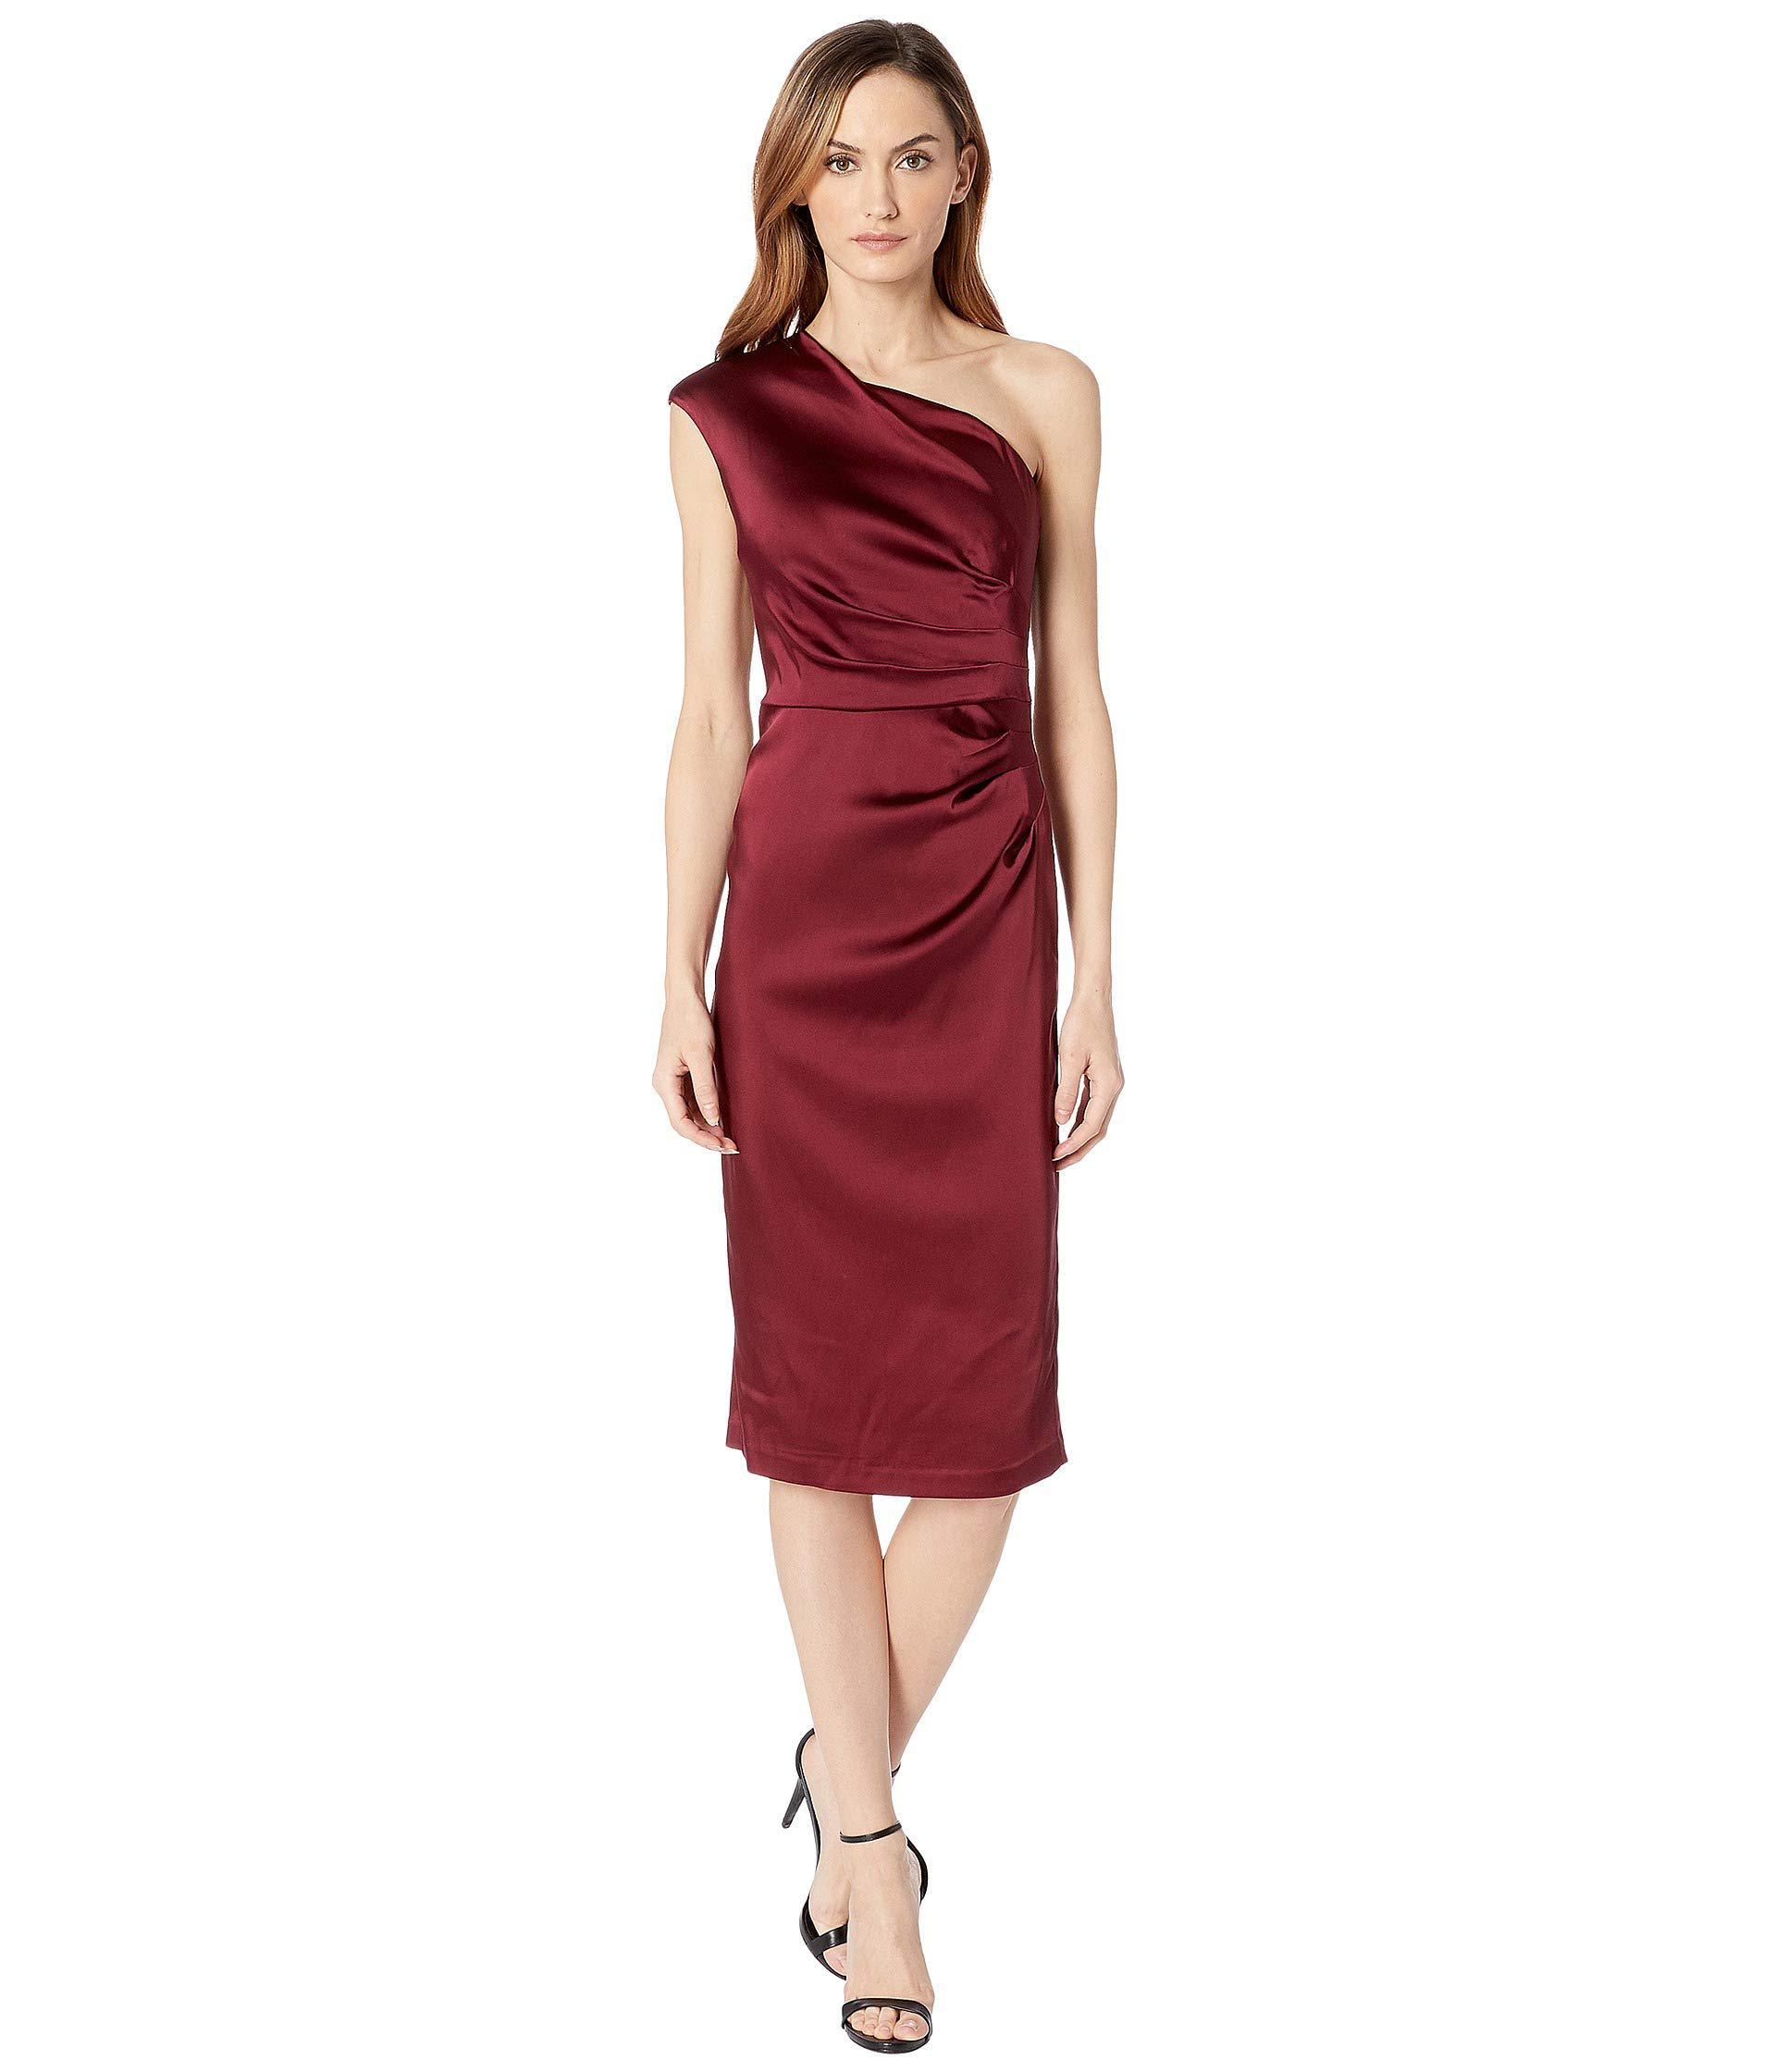 36b89c2a01c Lyst - Adrianna Papell Stretch Satin Short Dress (garnet) Women s ...